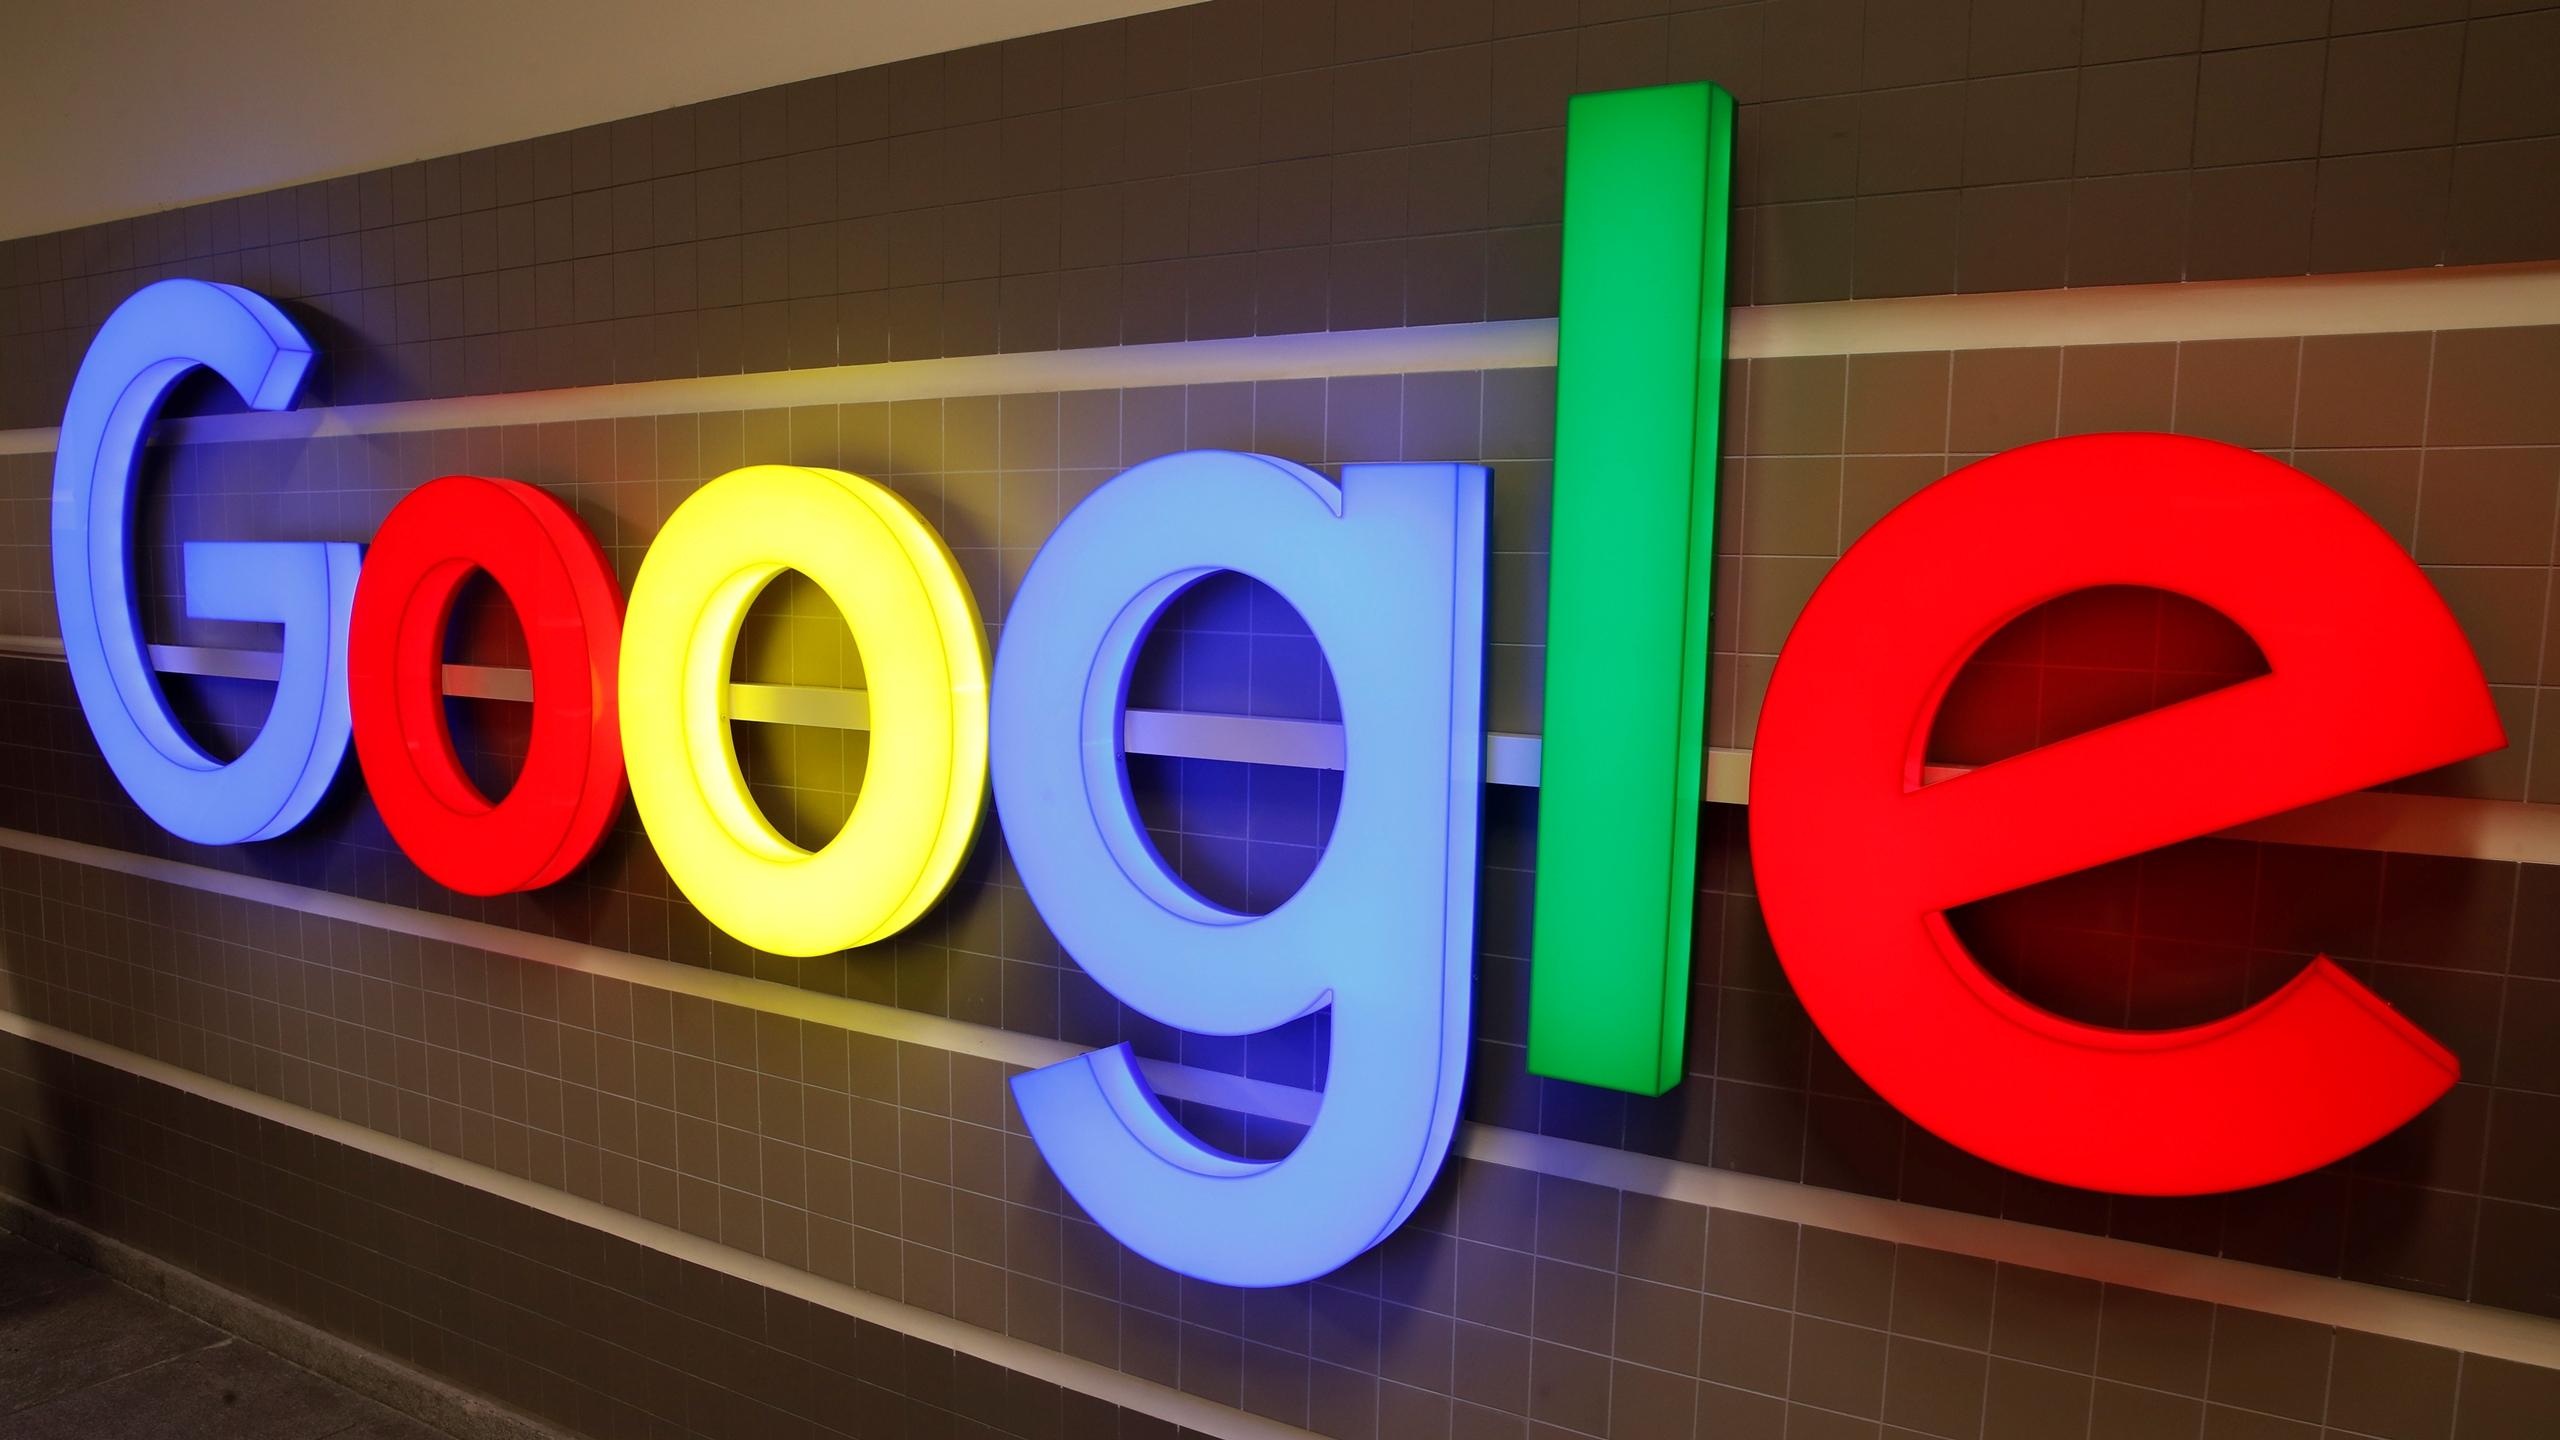 Google-empleados-home office-julio-2021